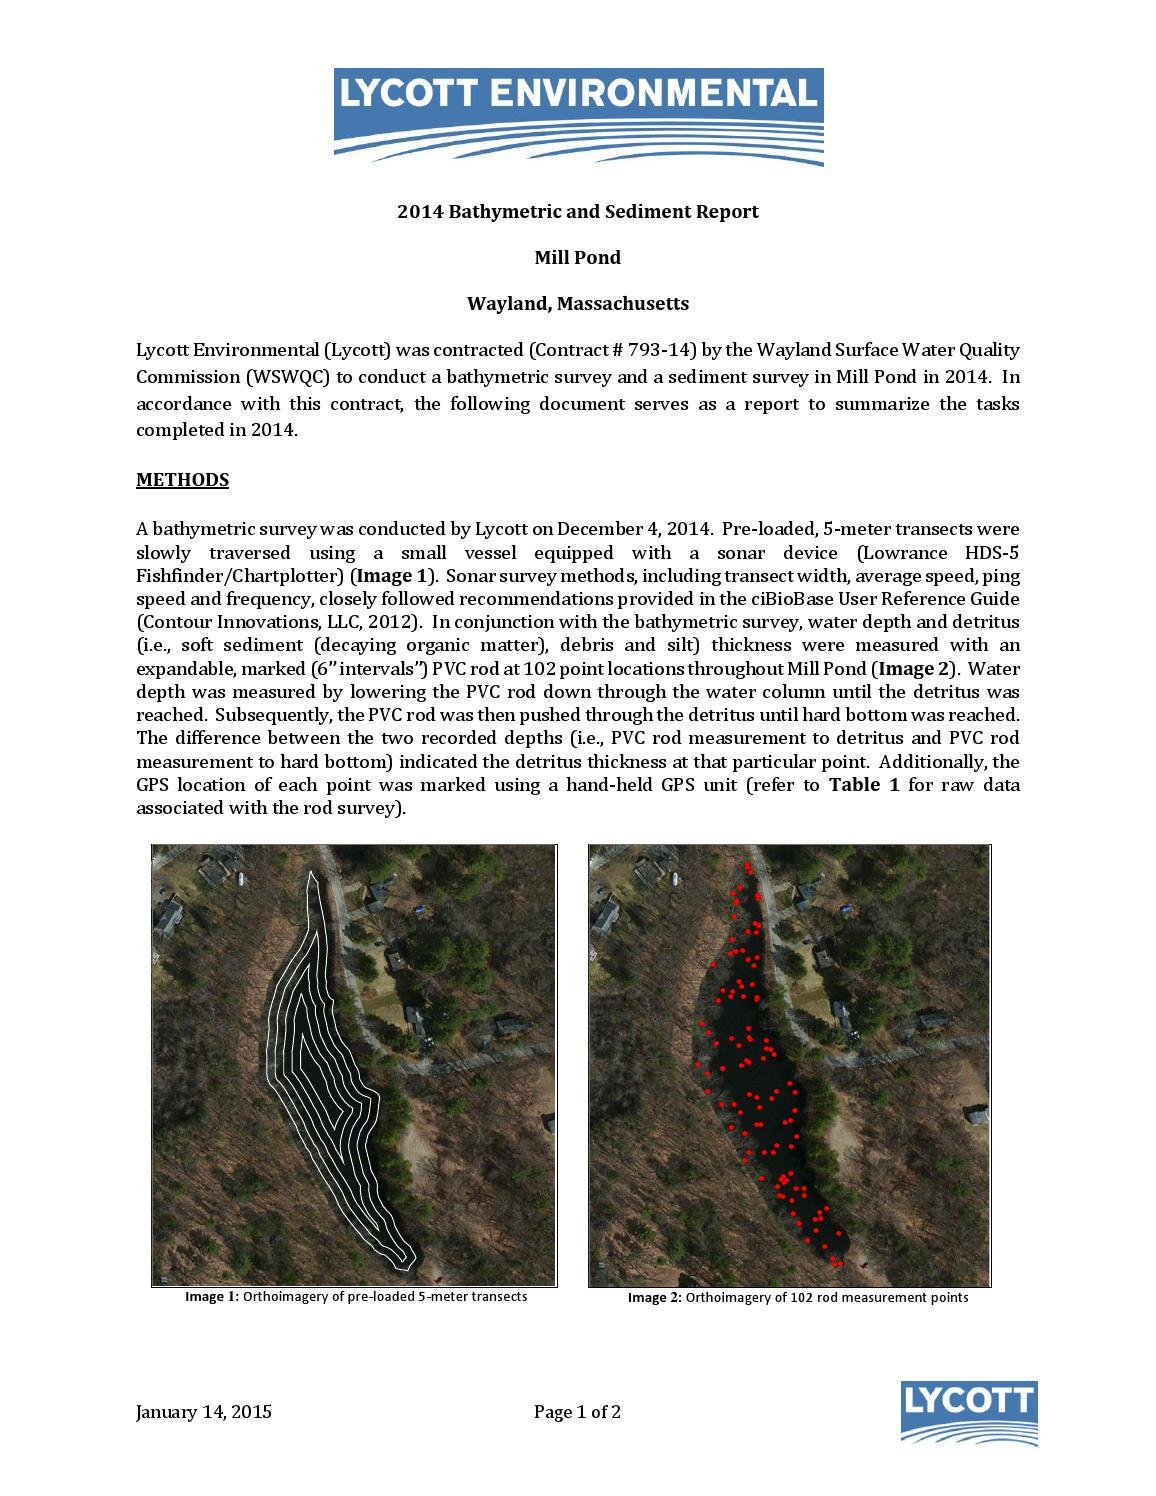 2014 Mill Pond Bathymetric & Sediment Survey by Wayland